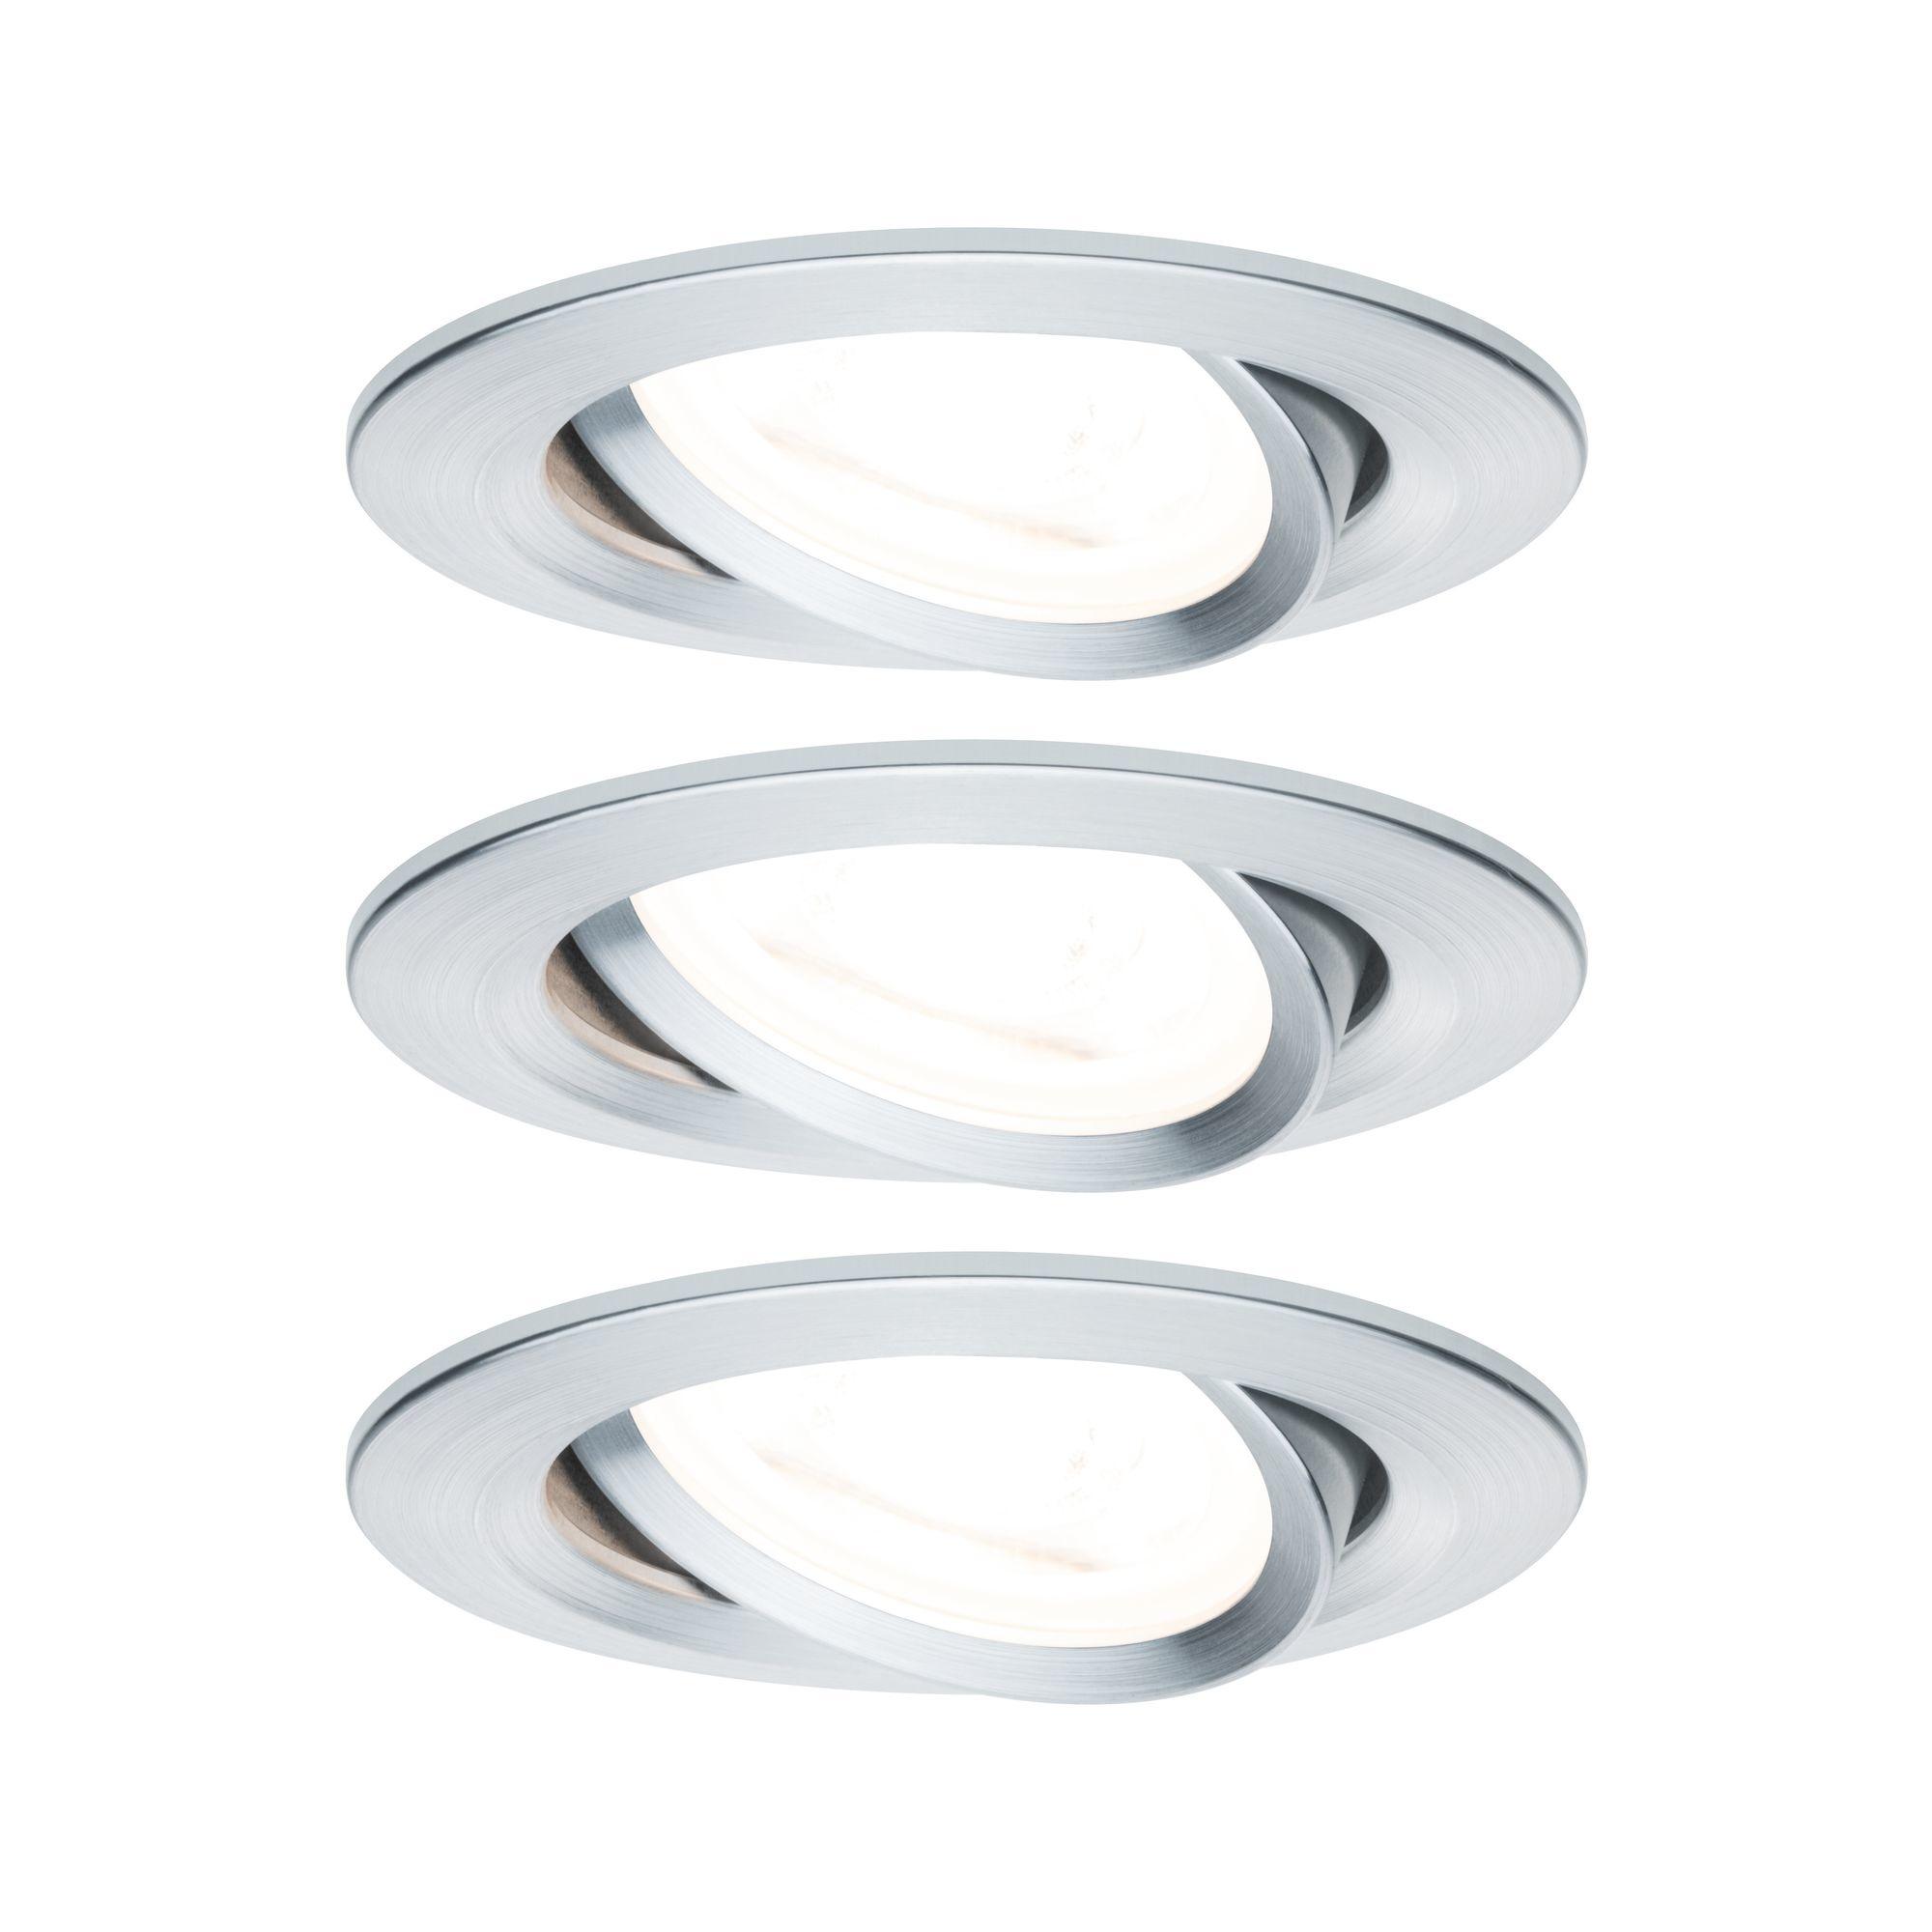 Paulmann EBL Set Nova rund schwenkbar LED 3x6,5W2700K 230V GU10 51mm Alu ged/Alu